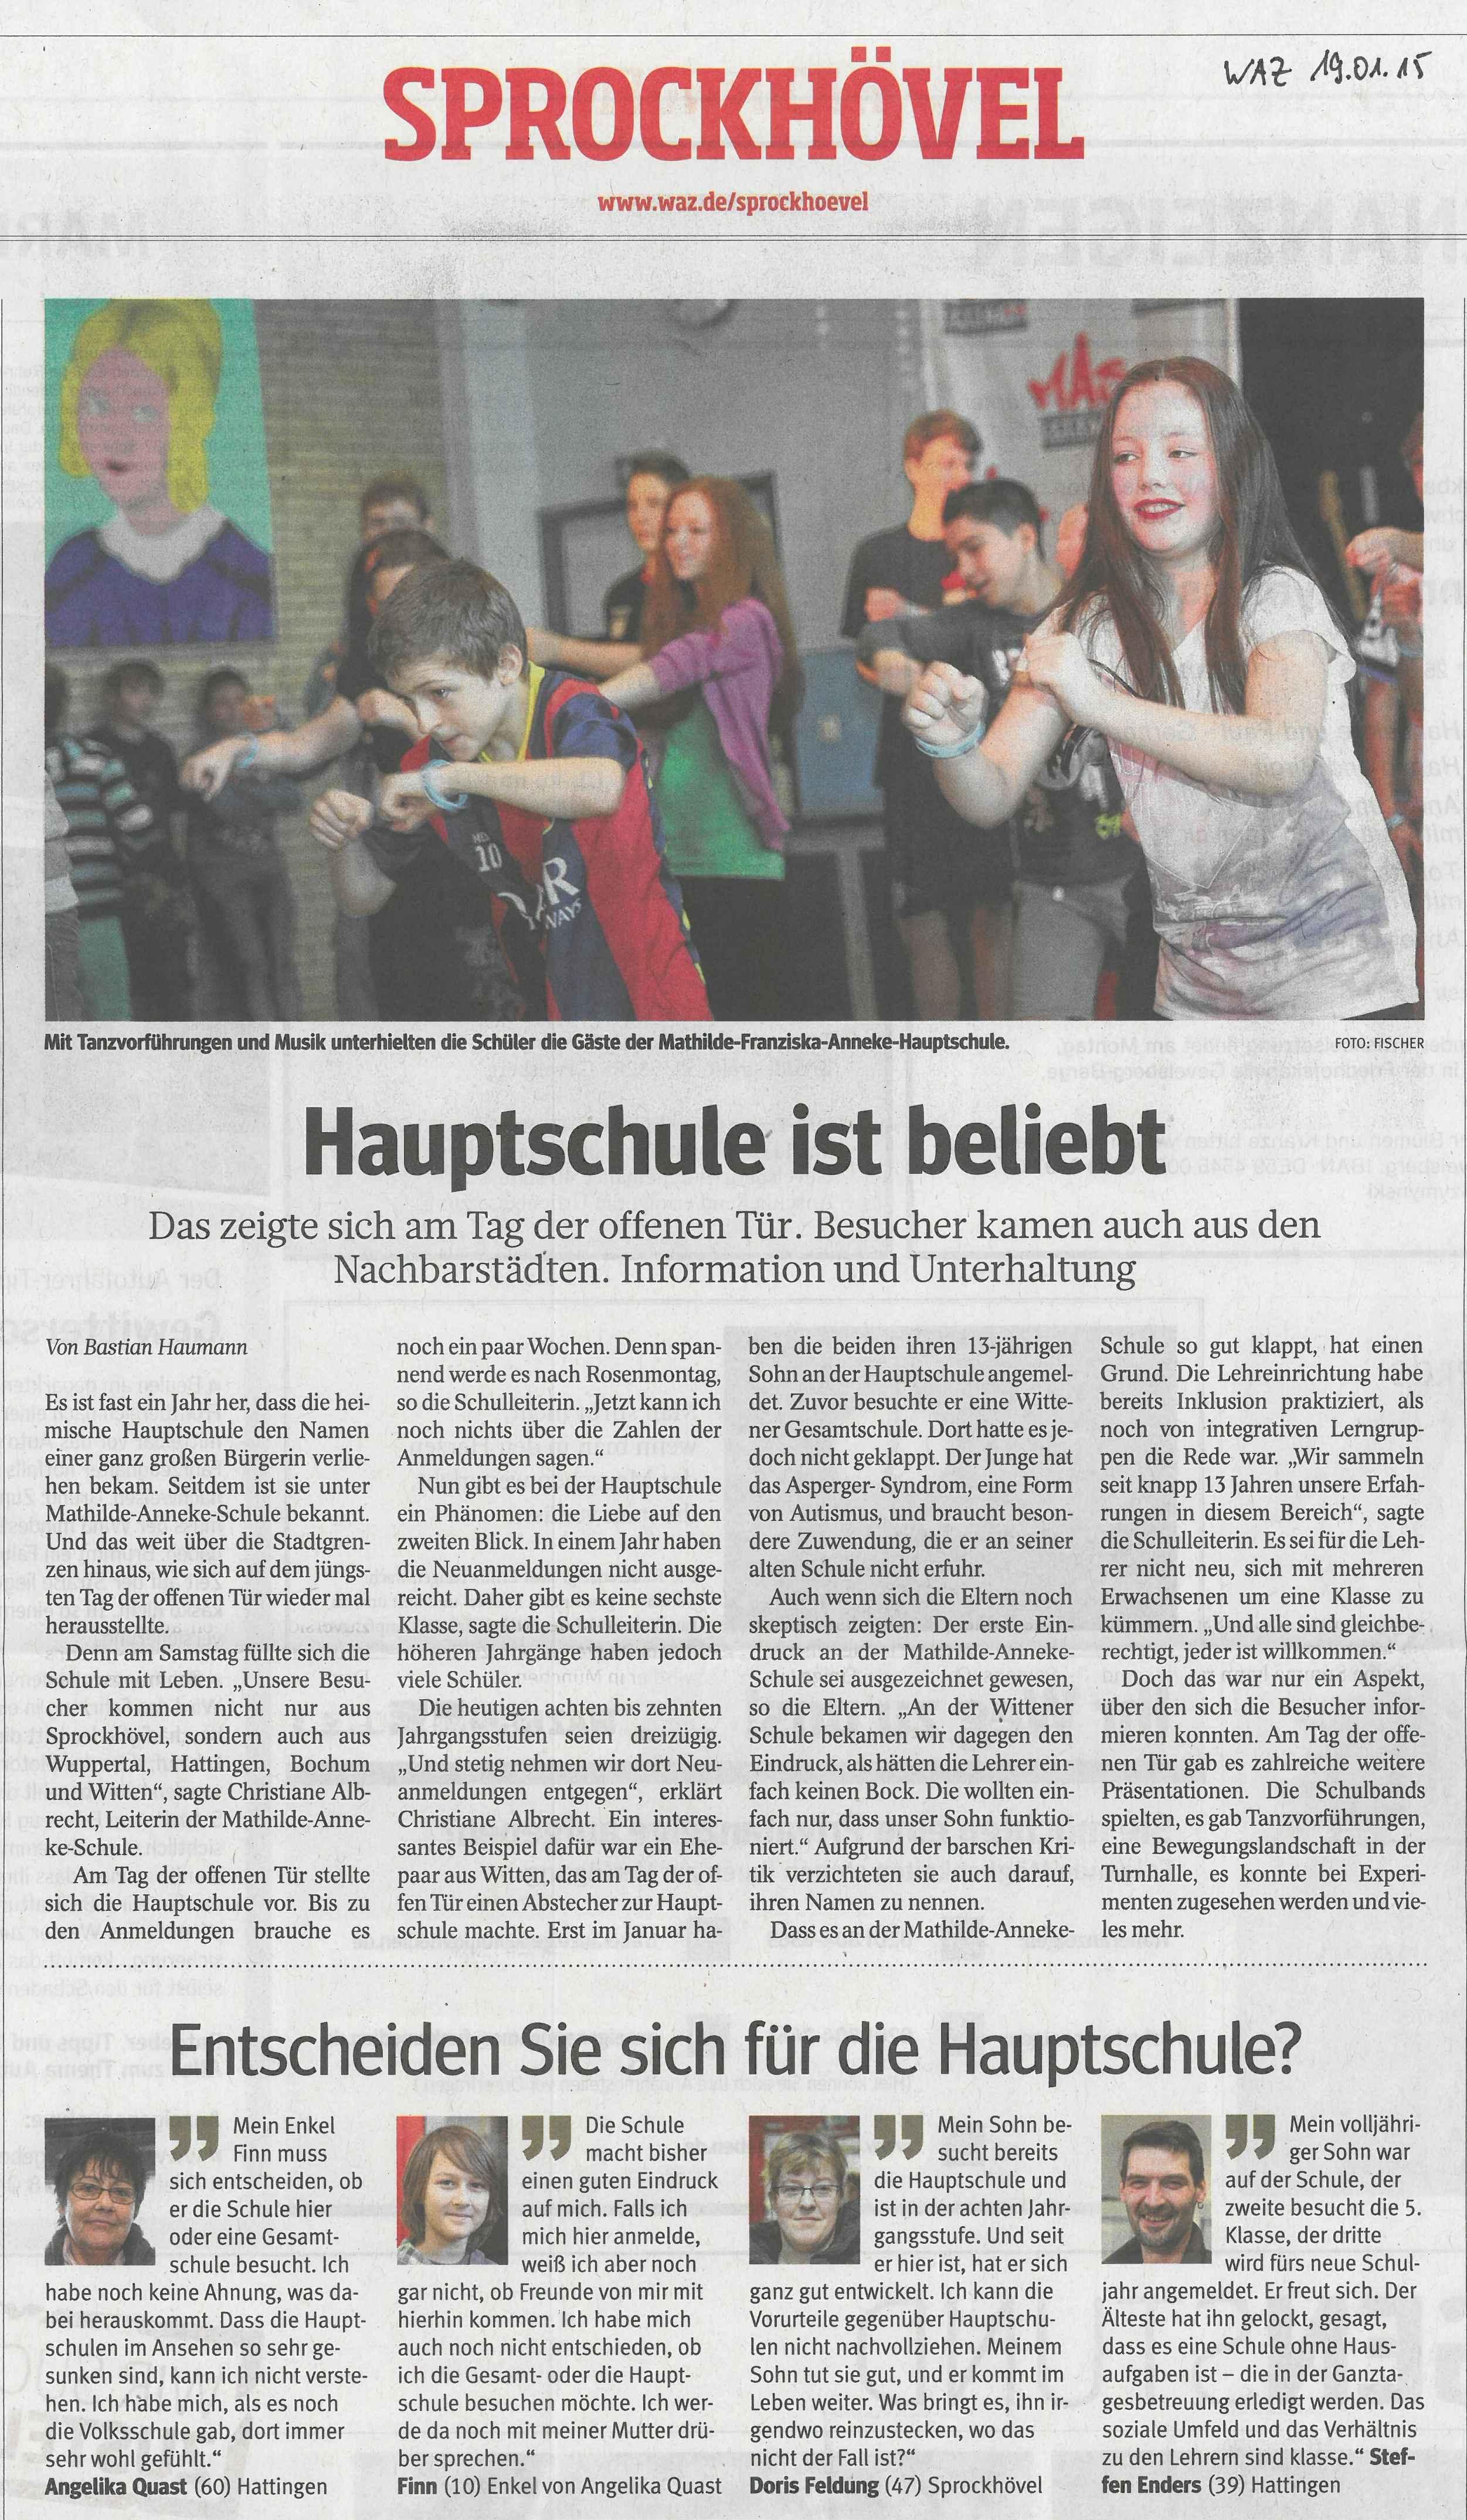 advise you Single Frauen Röthenbach kennenlernen valuable idea opinion